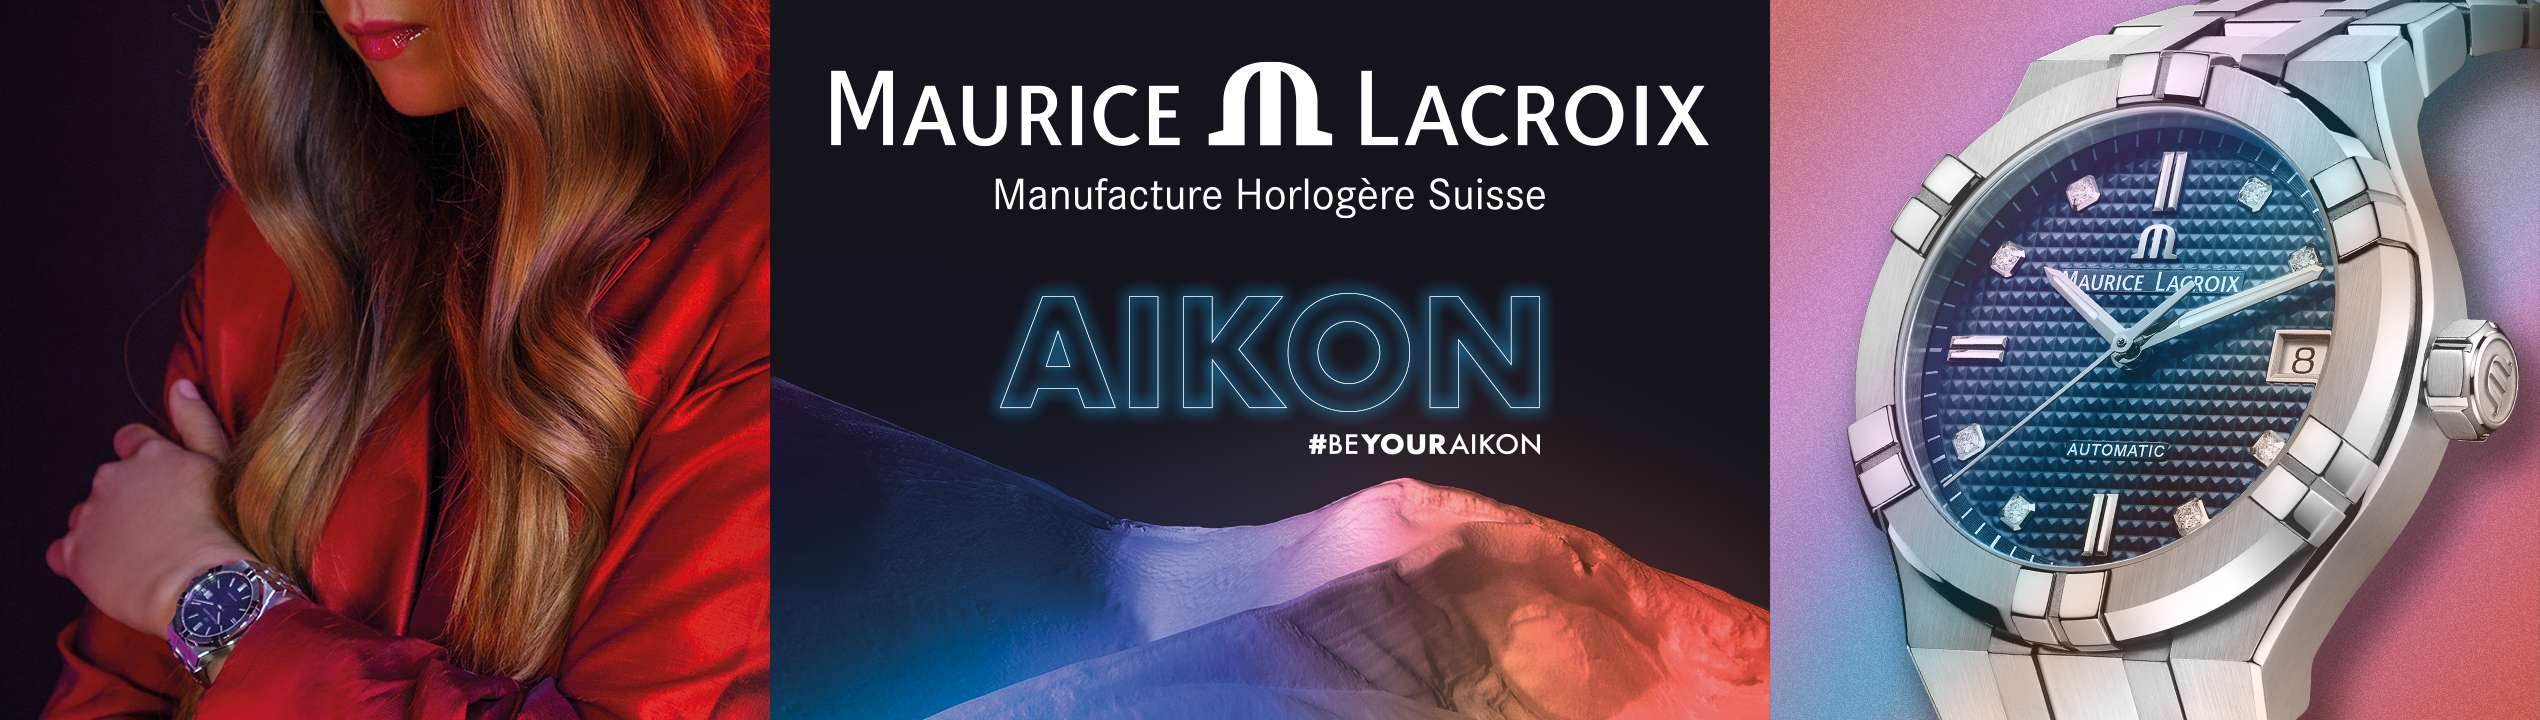 Maurice Lacroix Блок 1